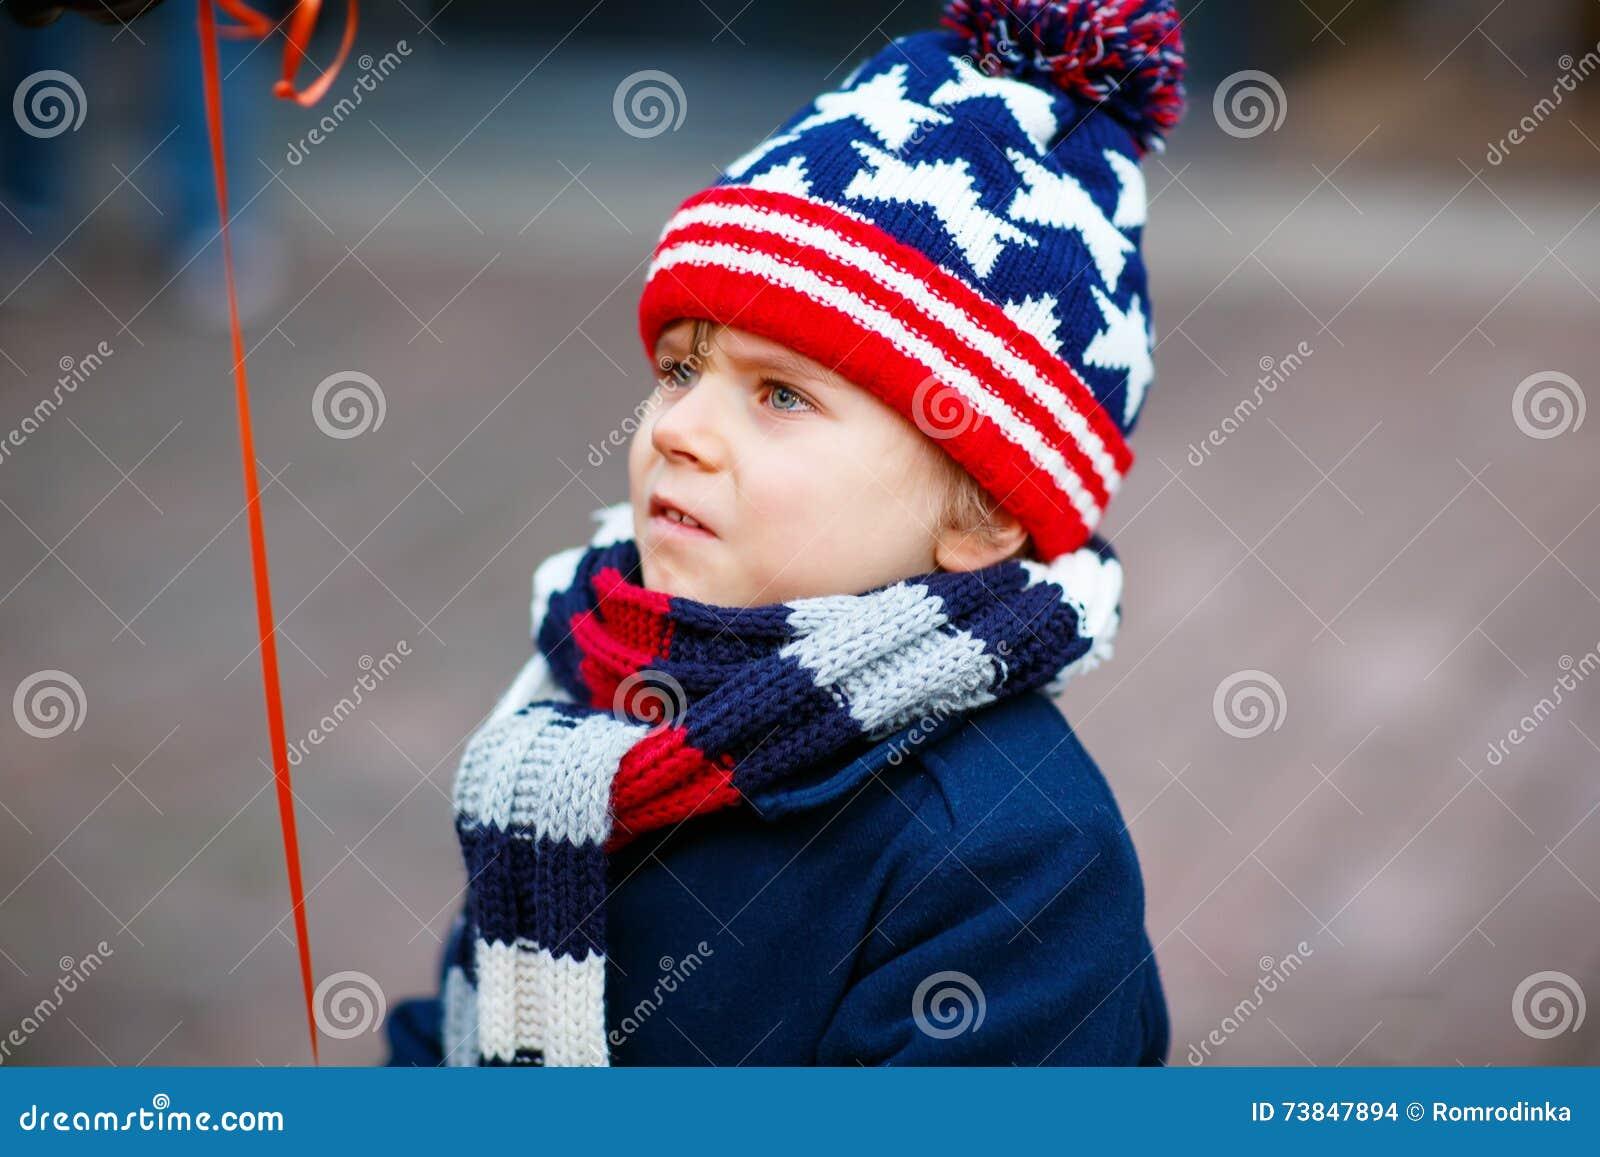 Little Sad Kid Boy Crying Outdoors On Christmas Market Stock Photo - Image of people ...